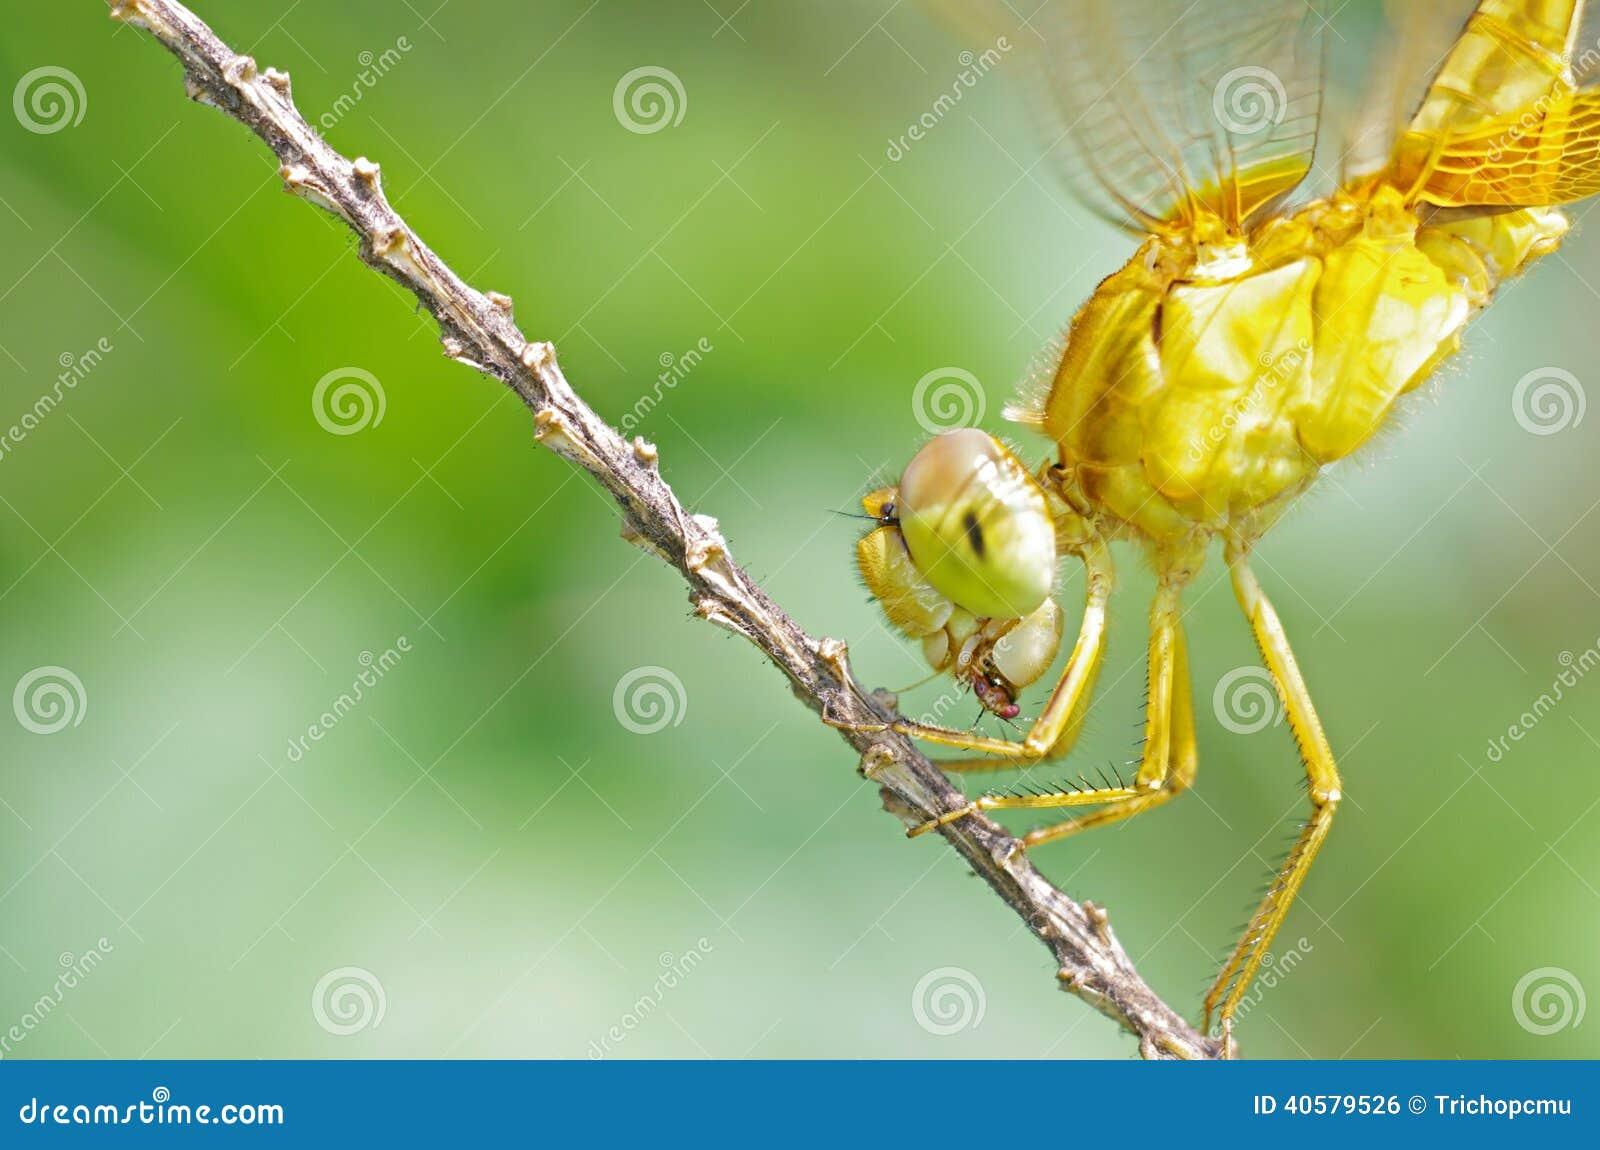 Dragonfly жуя добычу